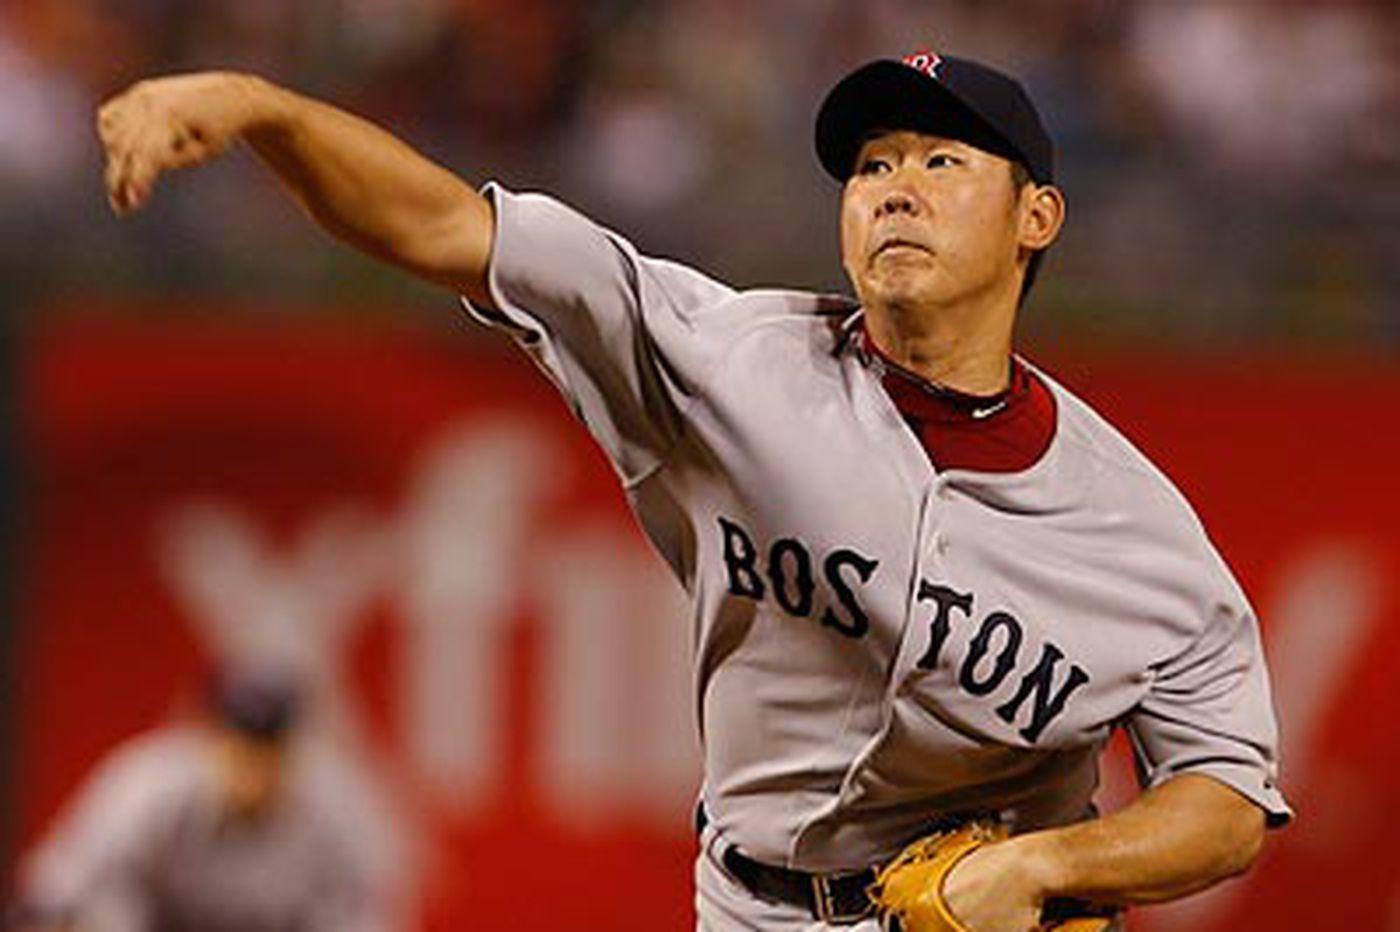 Phils fall to Boston, 5-0, but foil Matsuzaka's no-hit bid